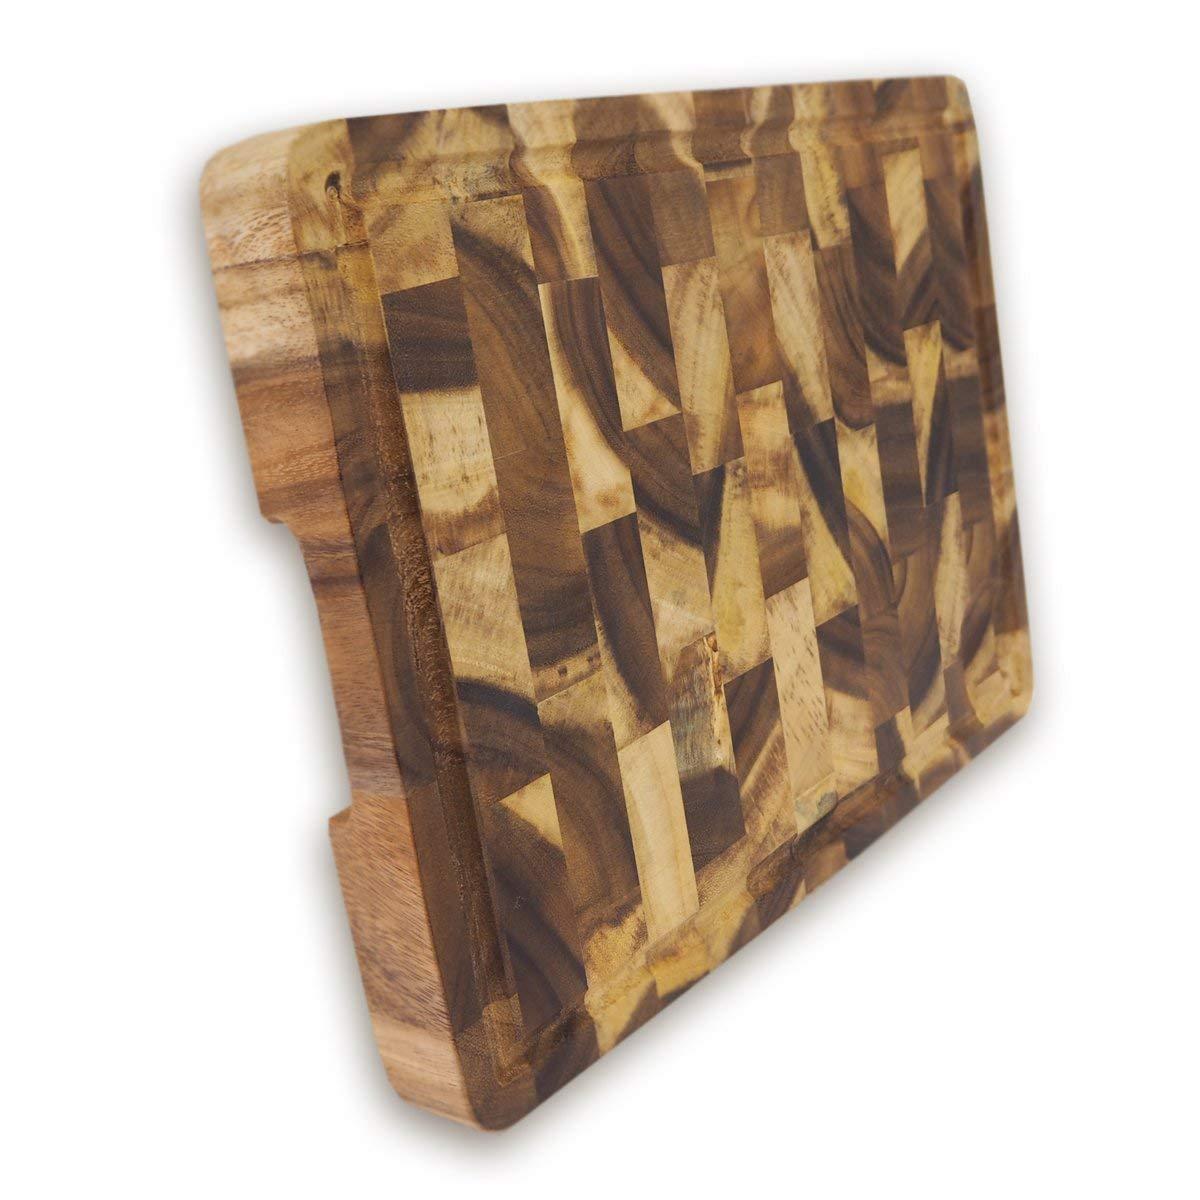 roro Rectangular End-Grain Acacia Kitchen Wood Cutting Board and Block by roro (Image #1)